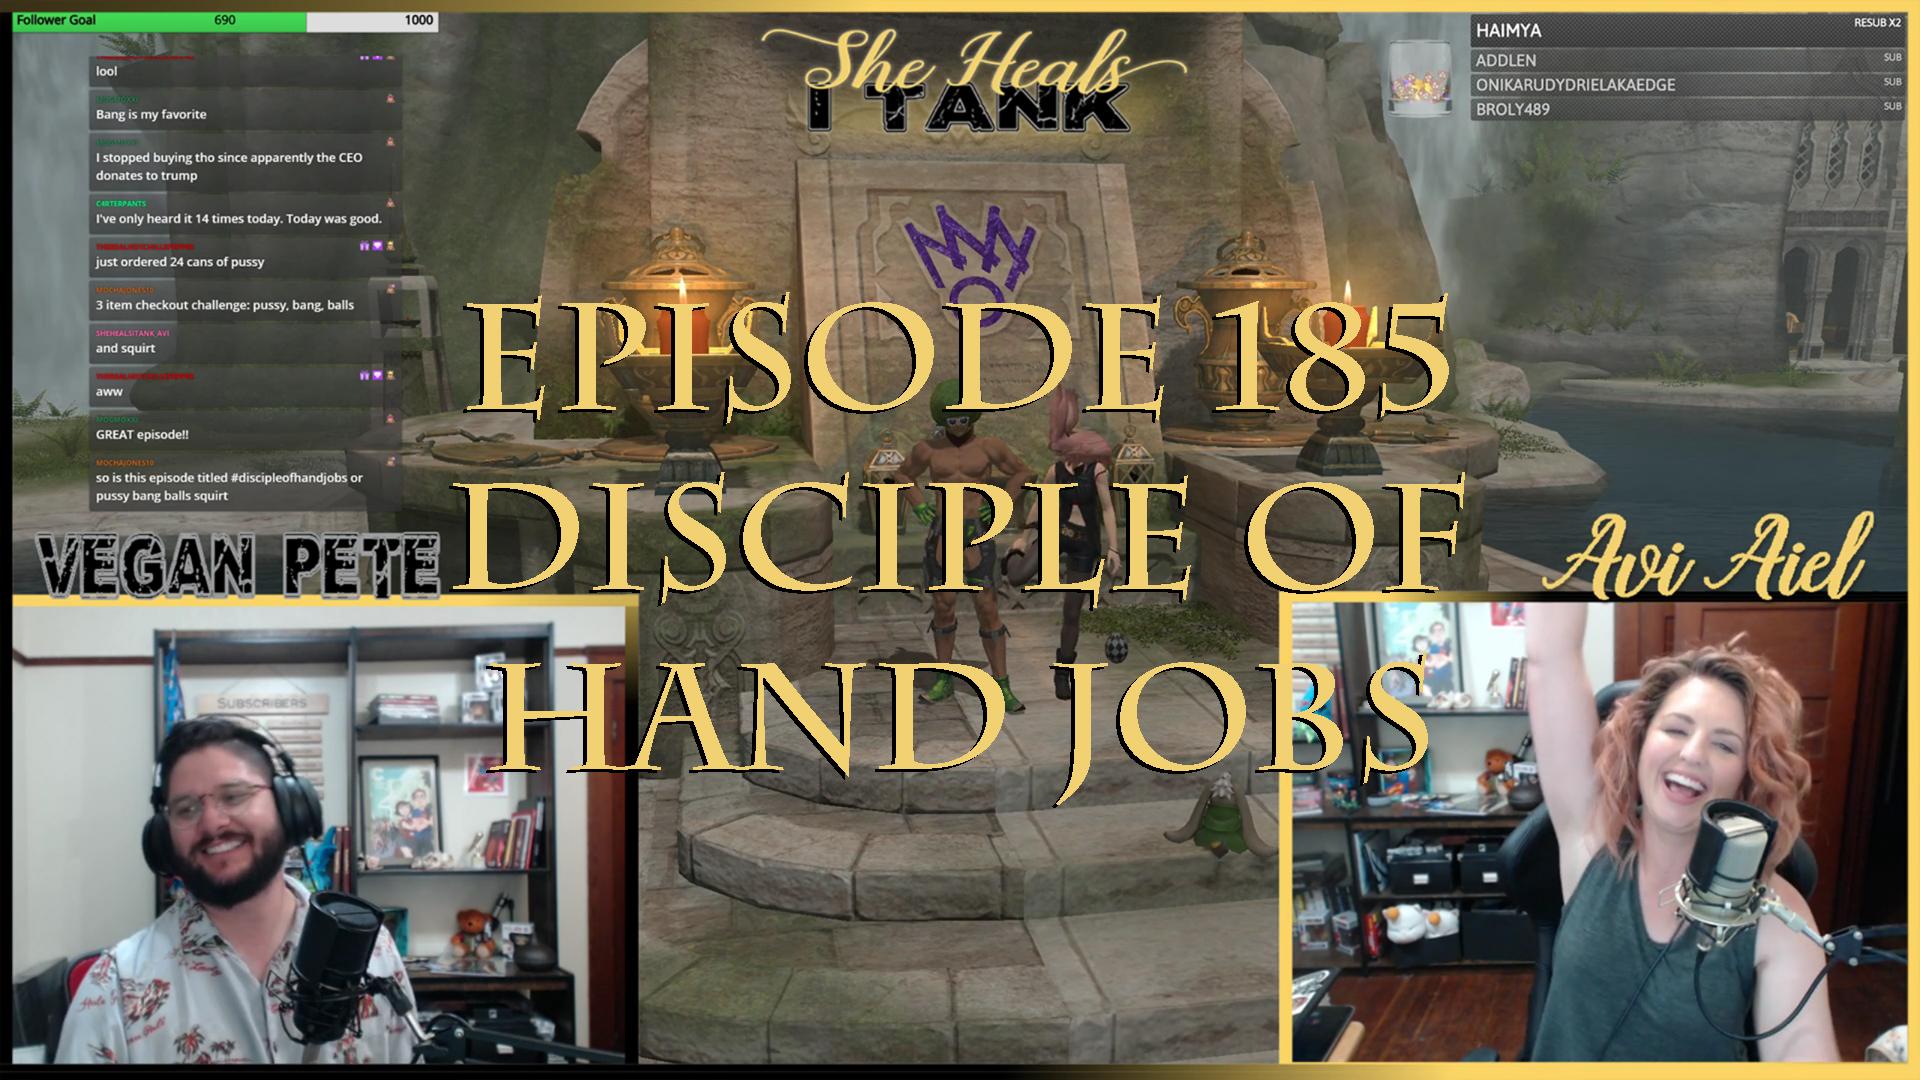 Episode 185: Disciple Of Hand Jobs She Heals I Tank: A